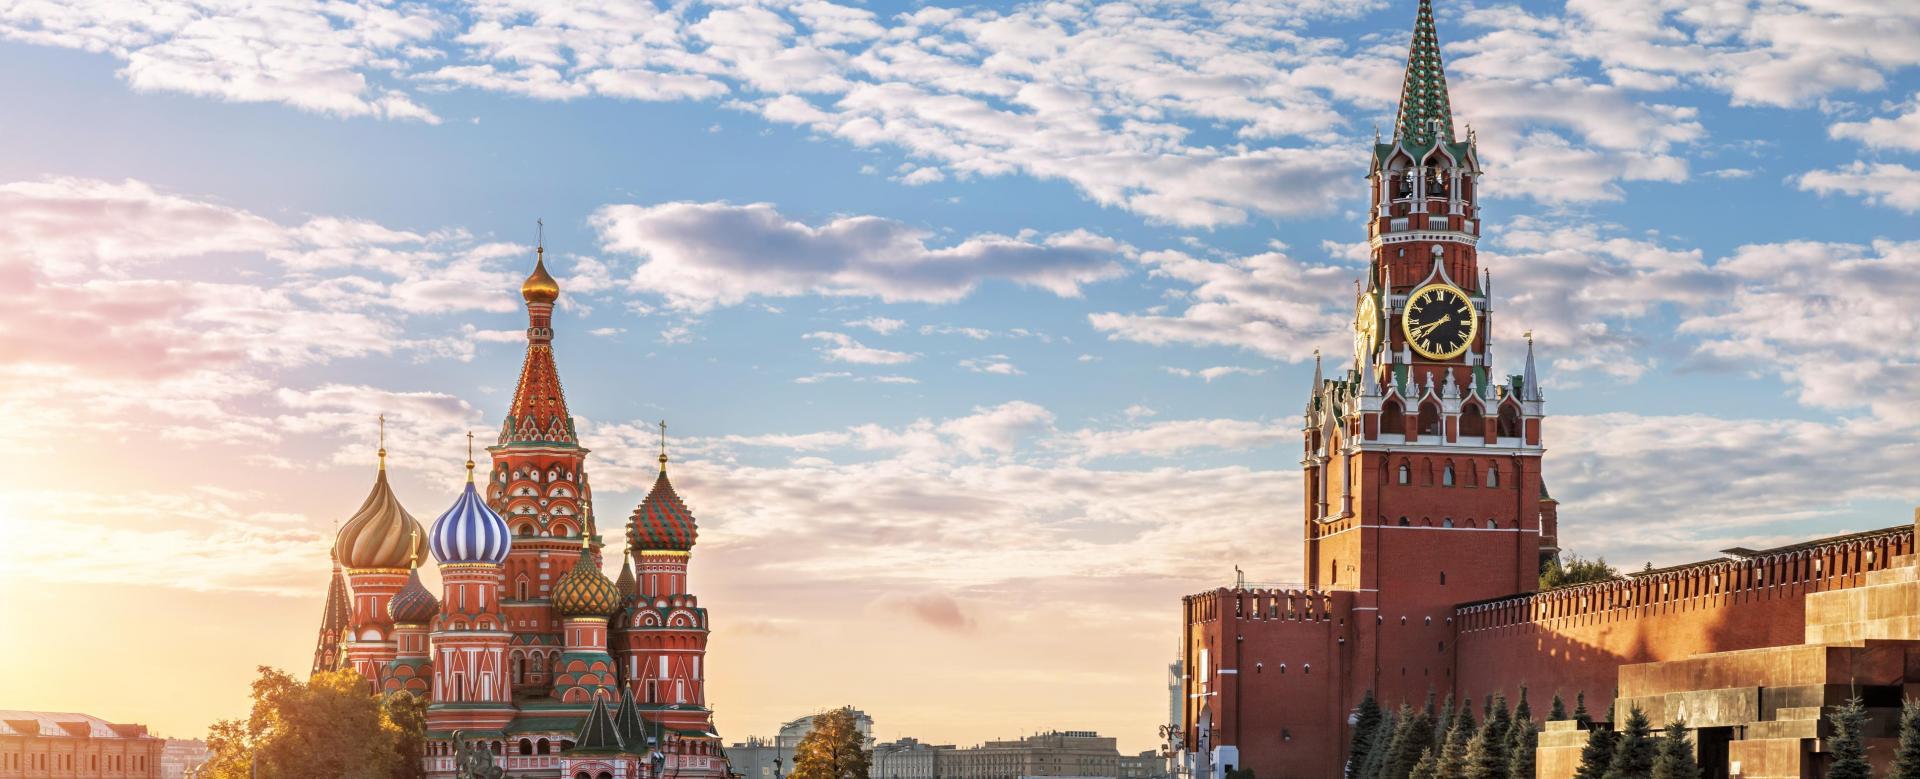 Trekking Russie : Moscou, l'anneau d'or, saint-pétersbourg